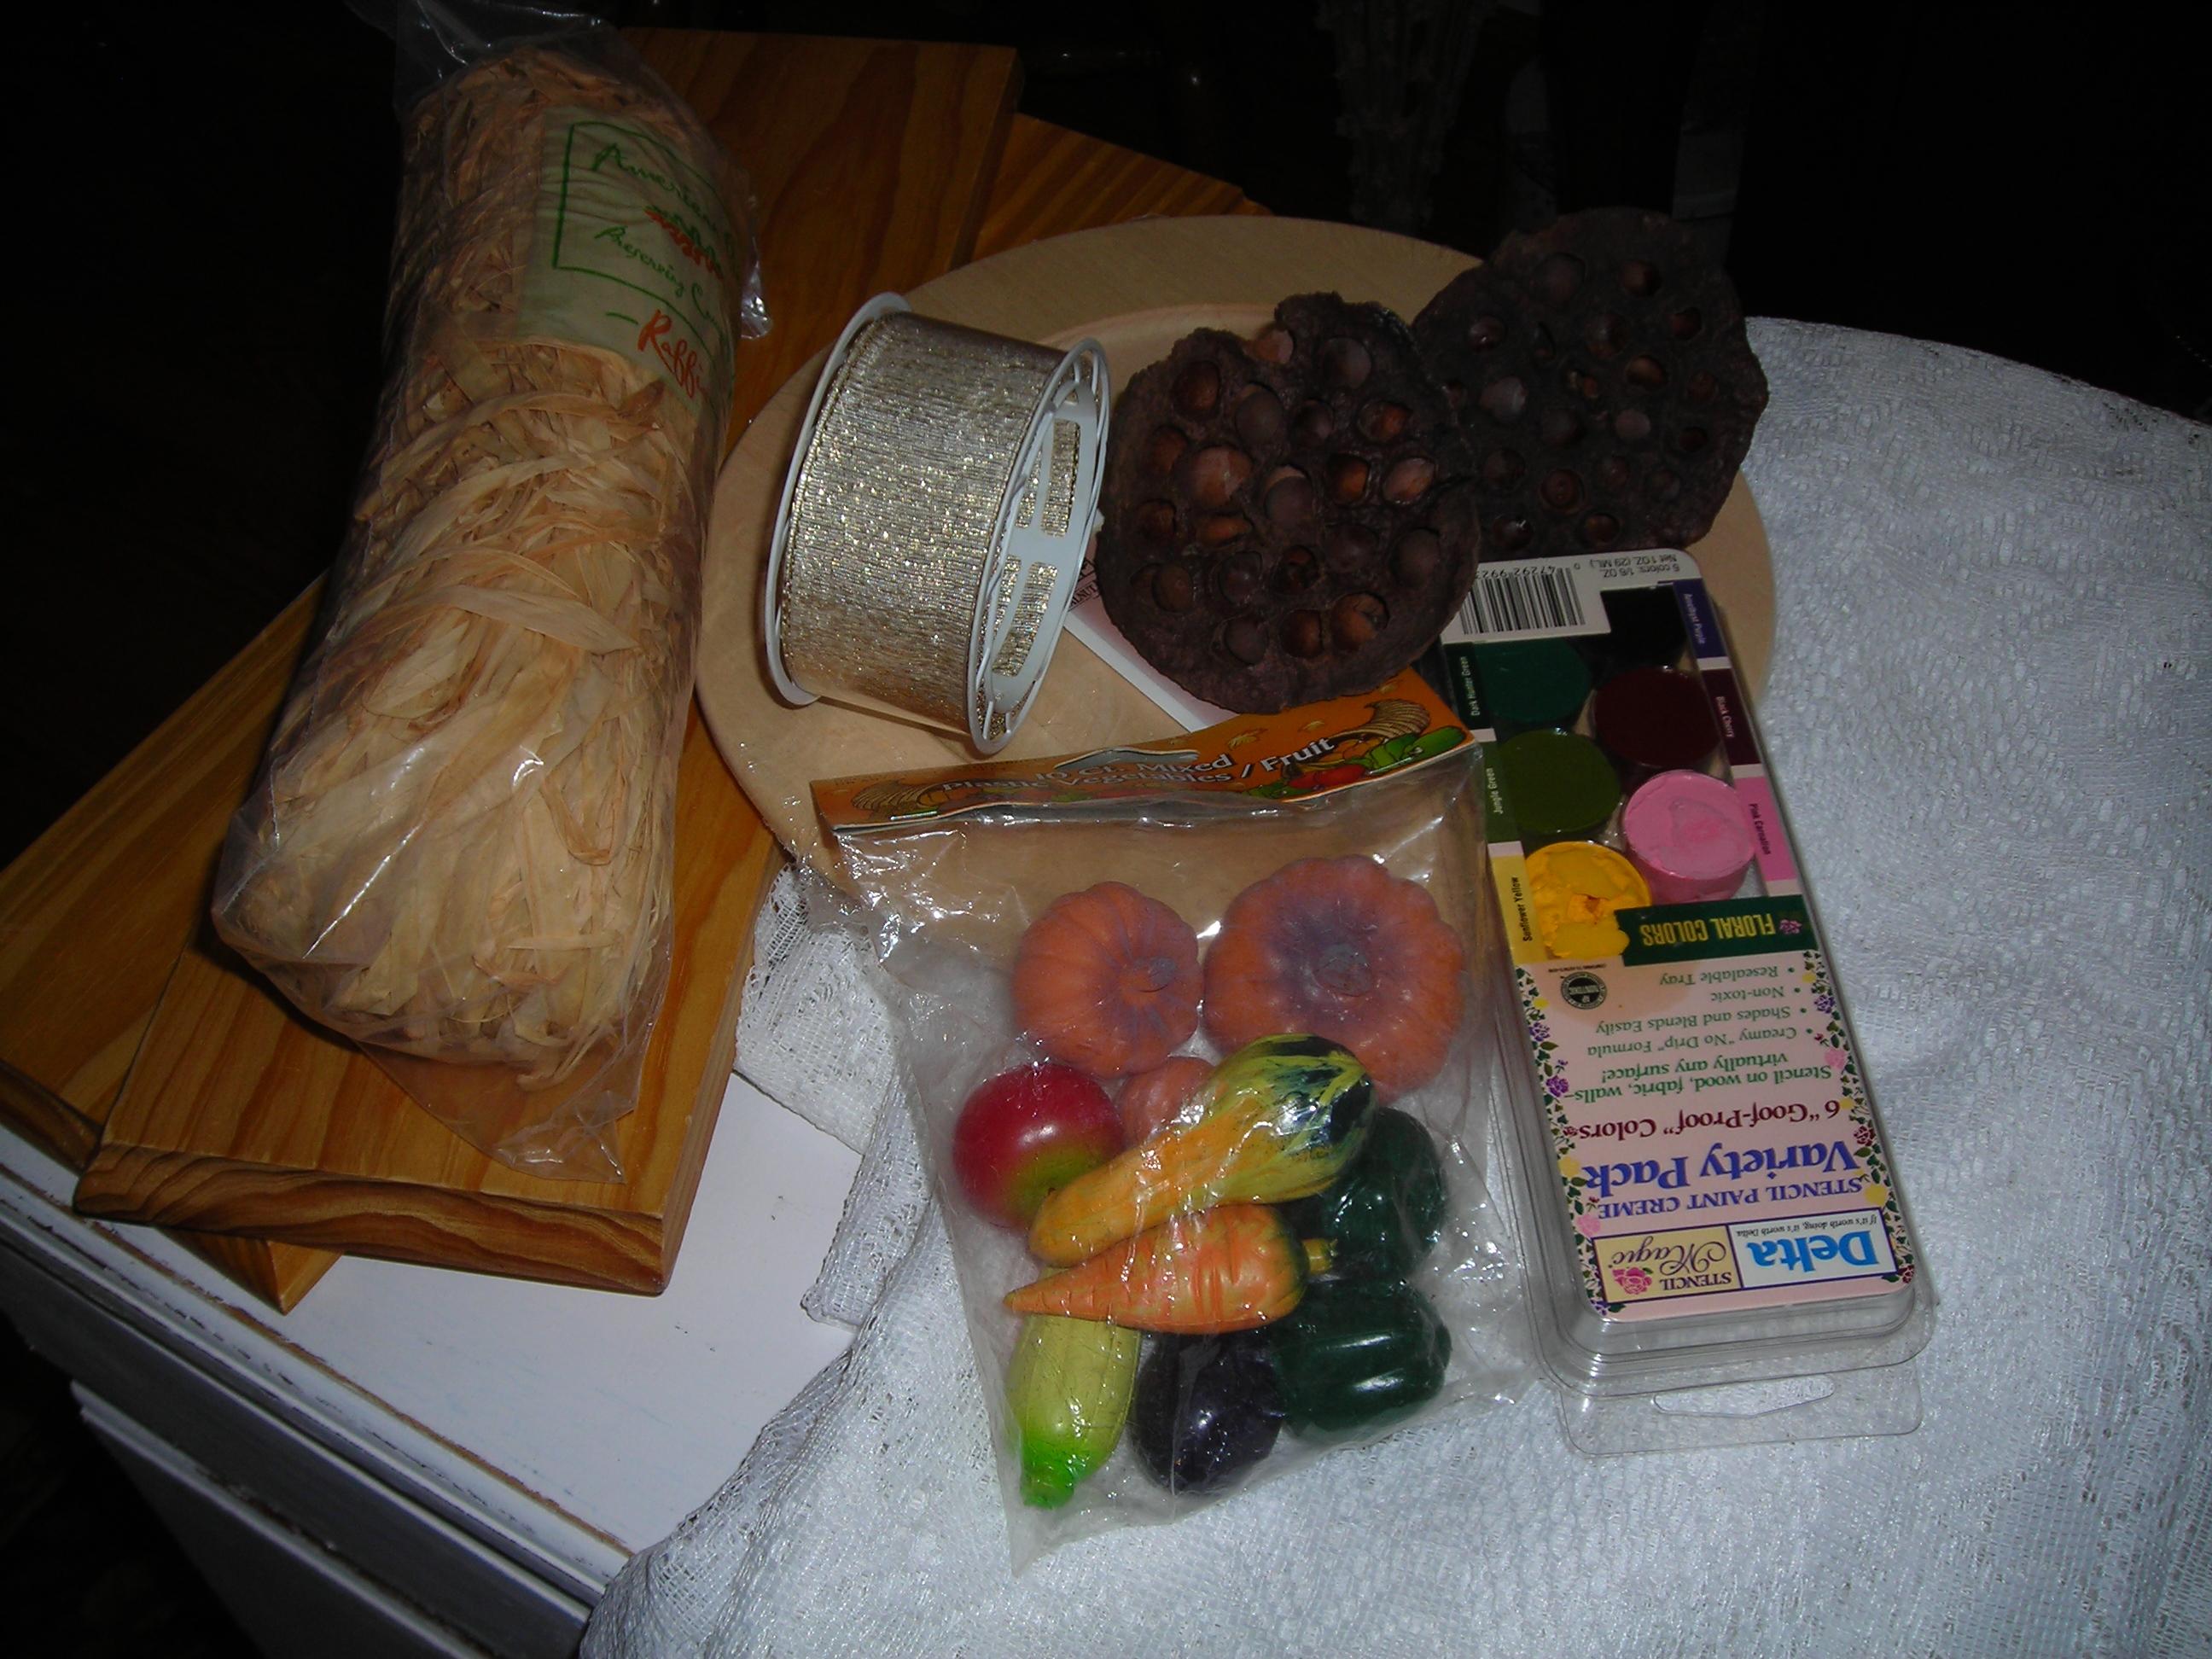 Crafting supplies ... 2 boards, fall veggies, paint, ribbon, etc.